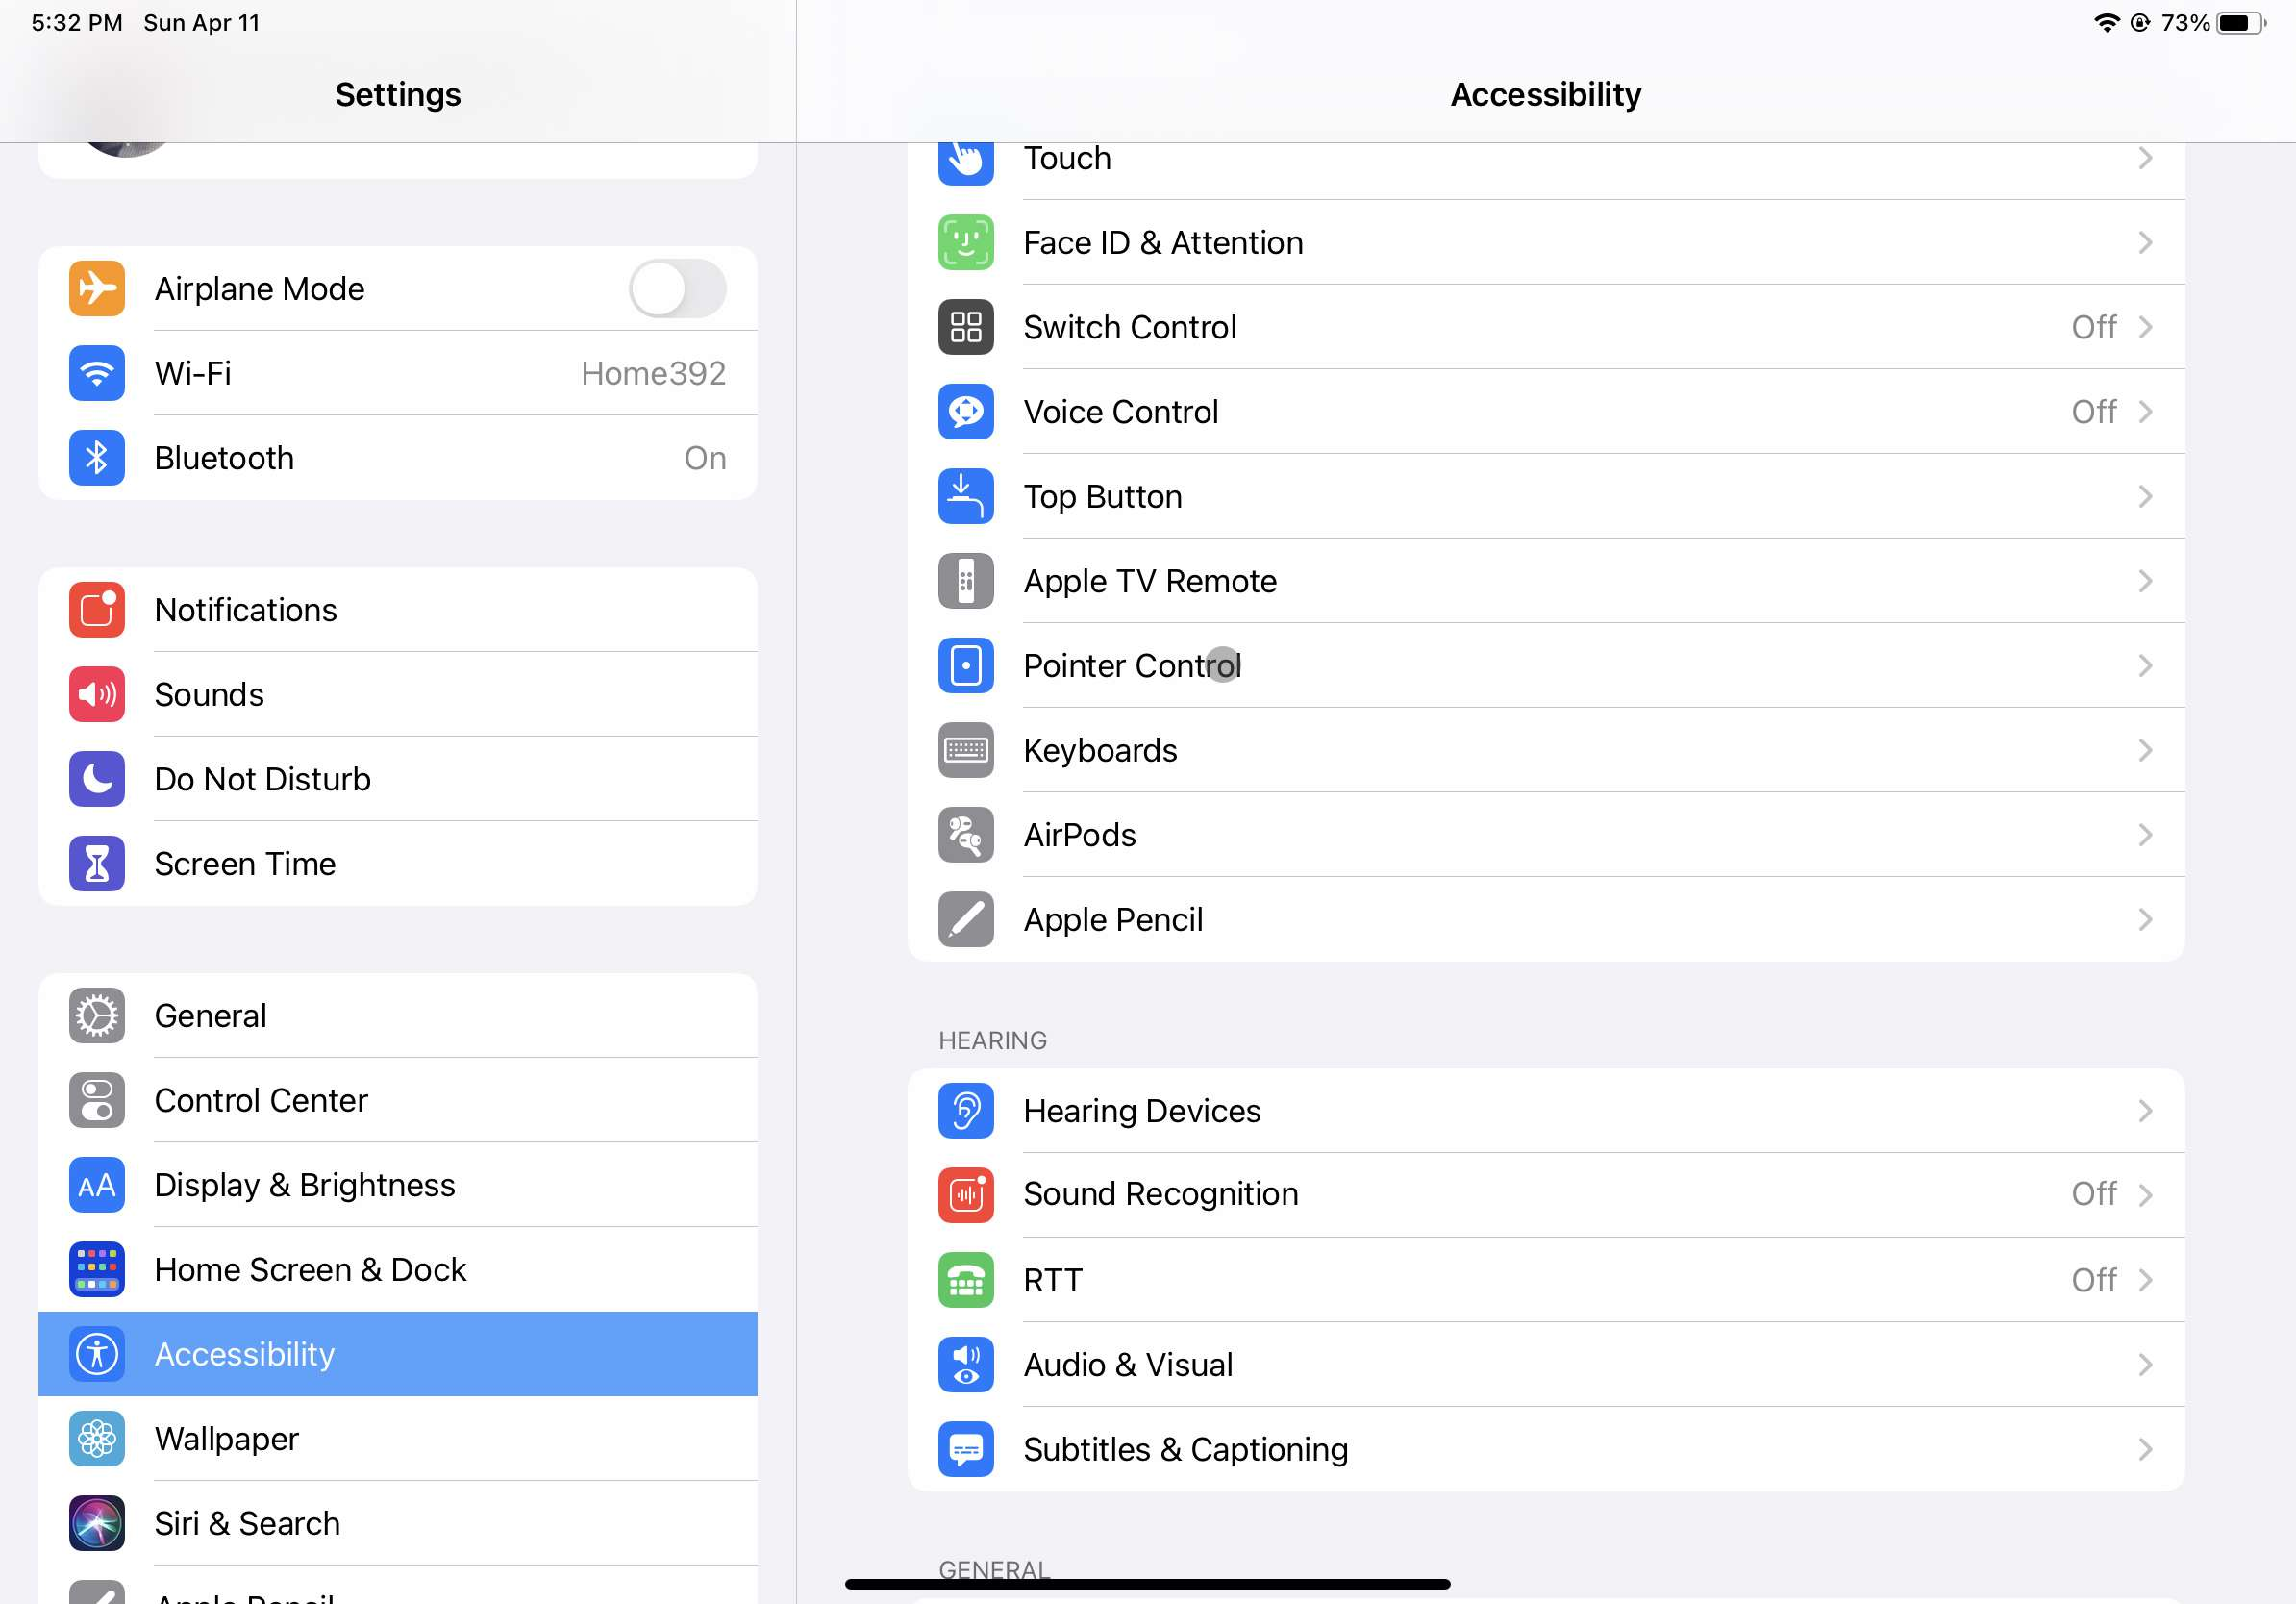 Screenshot of the iPad Accessibility menu